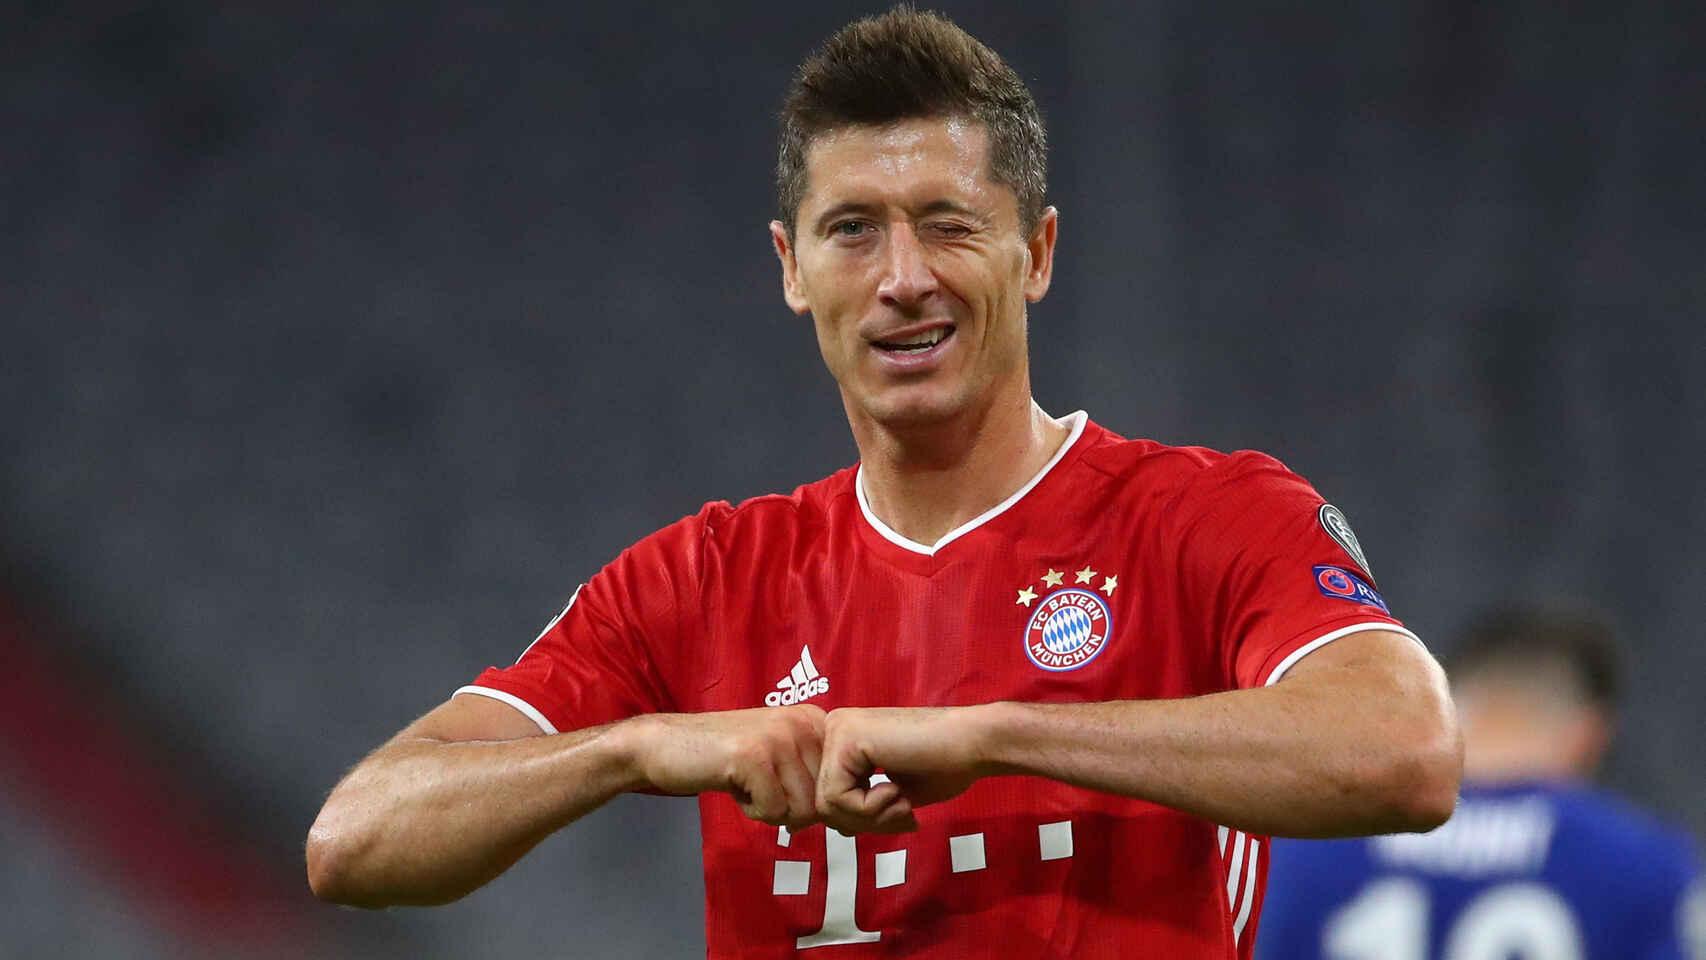 Robert Lewandowski Cuarto Máximo Goleador Histórico De La Champions League